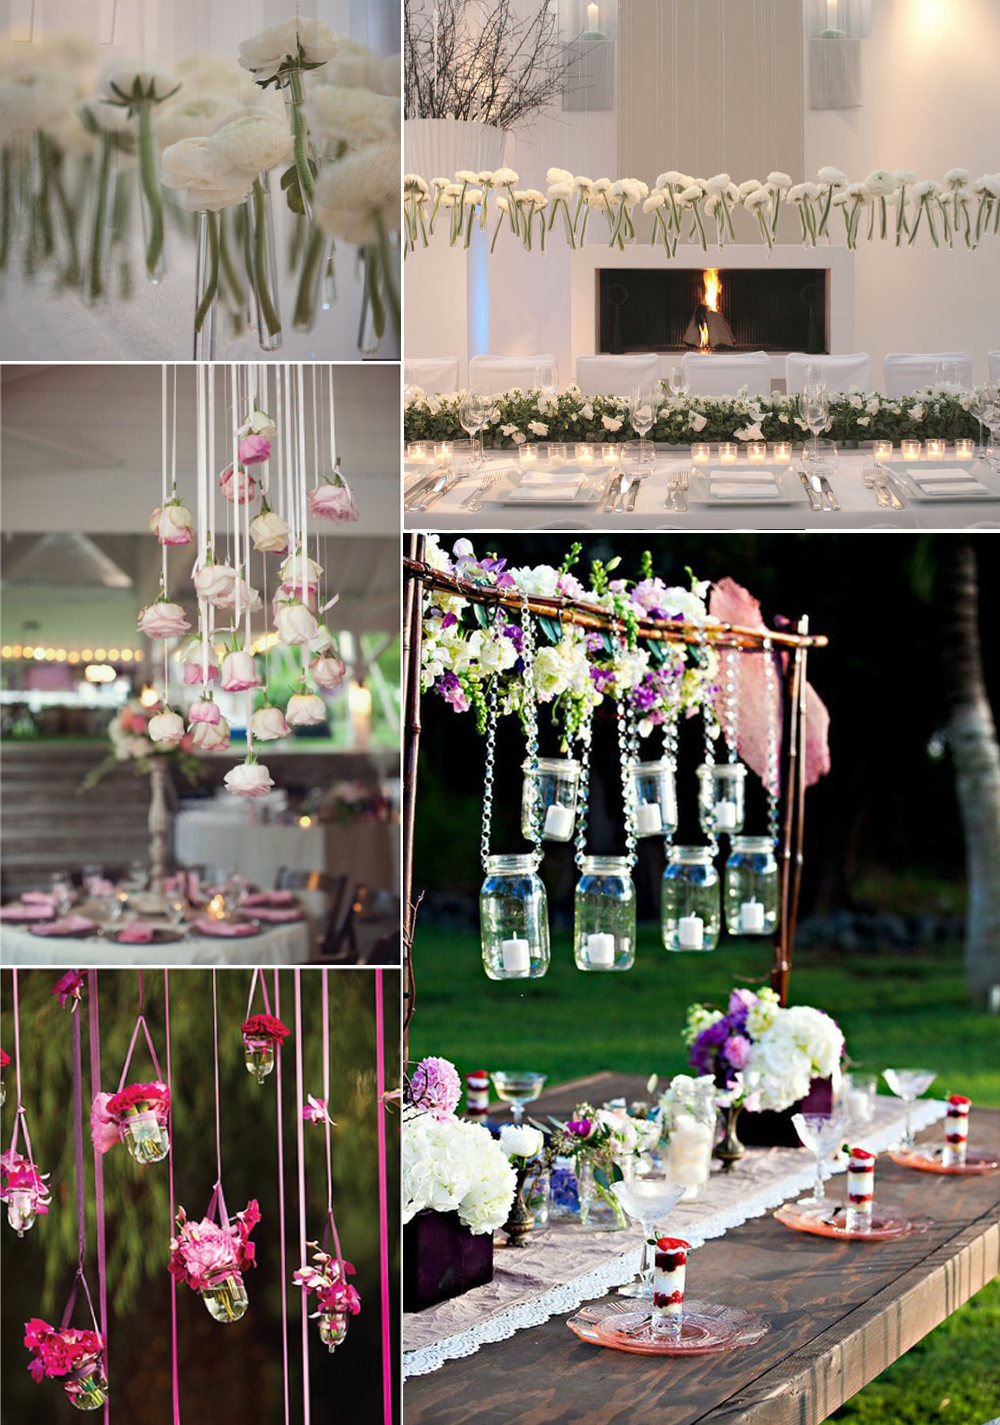 unique wedding flower ideas hanging centerpieces. Credit: none